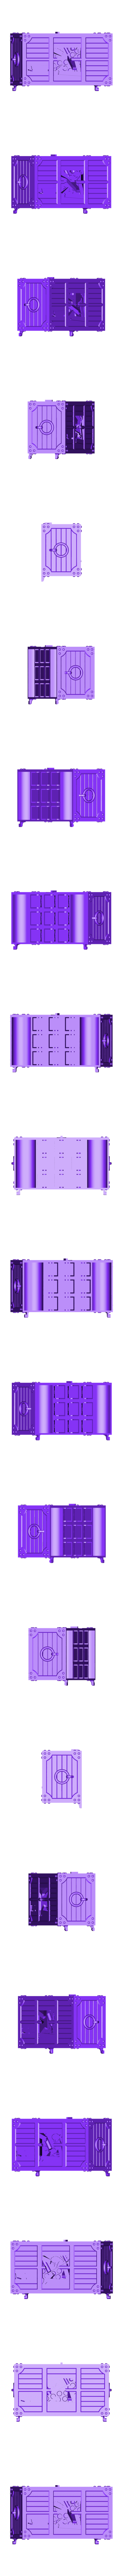 TicTacToe_Treasure_Chest_Bottom.STL Télécharger fichier STL gratuit Treasure Tic Tac Toe • Plan à imprimer en 3D, JonathanK1906